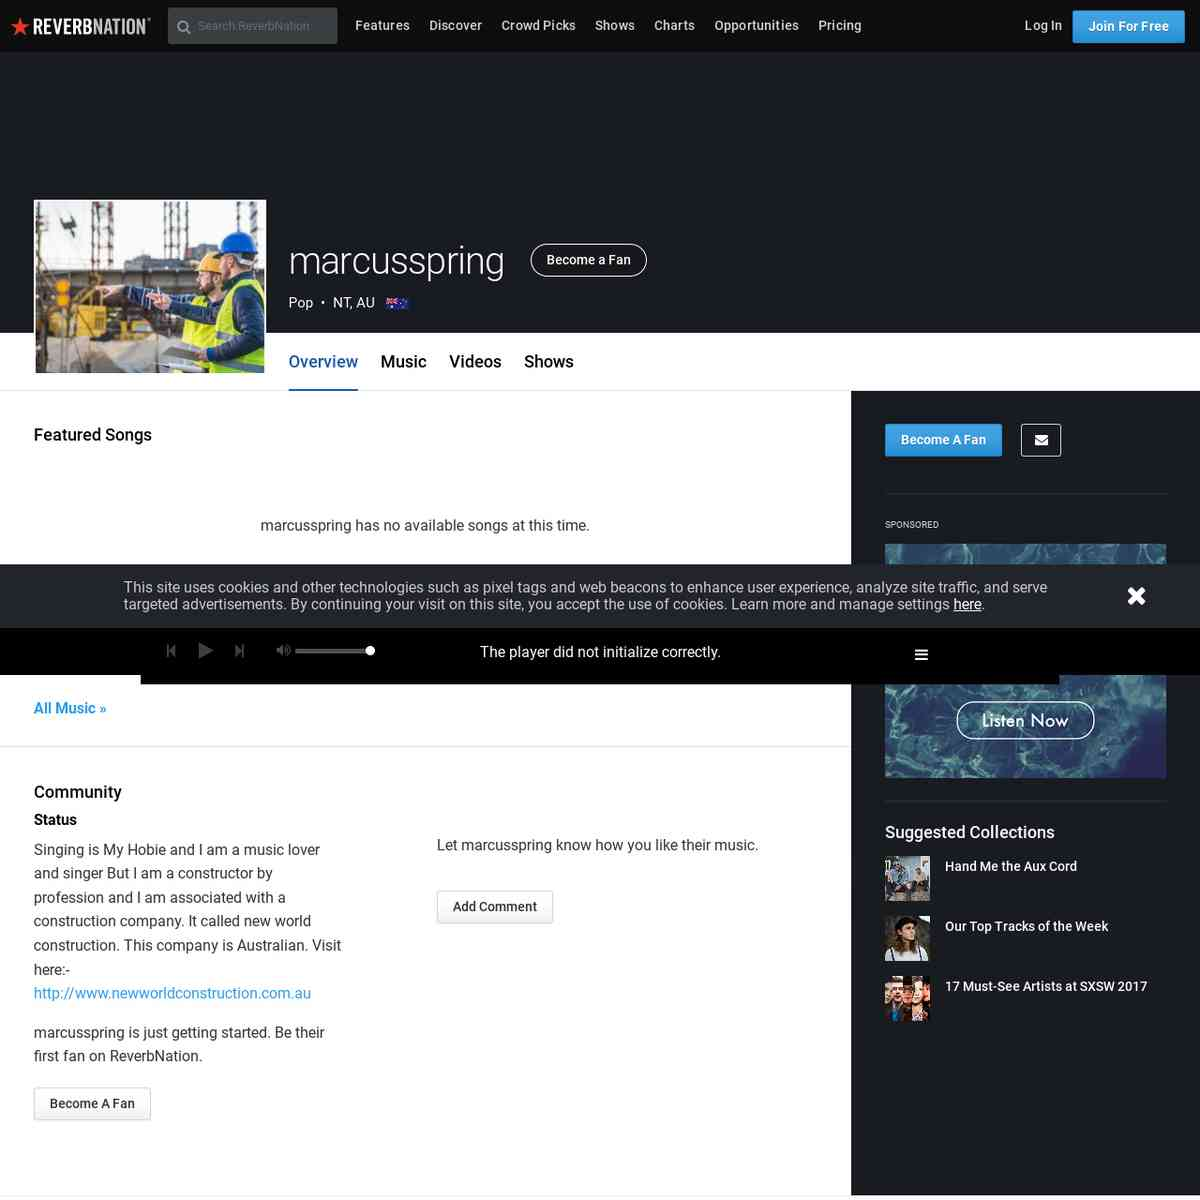 reverbnation.com/marcusspring?profile_view_source=header_icon_nav